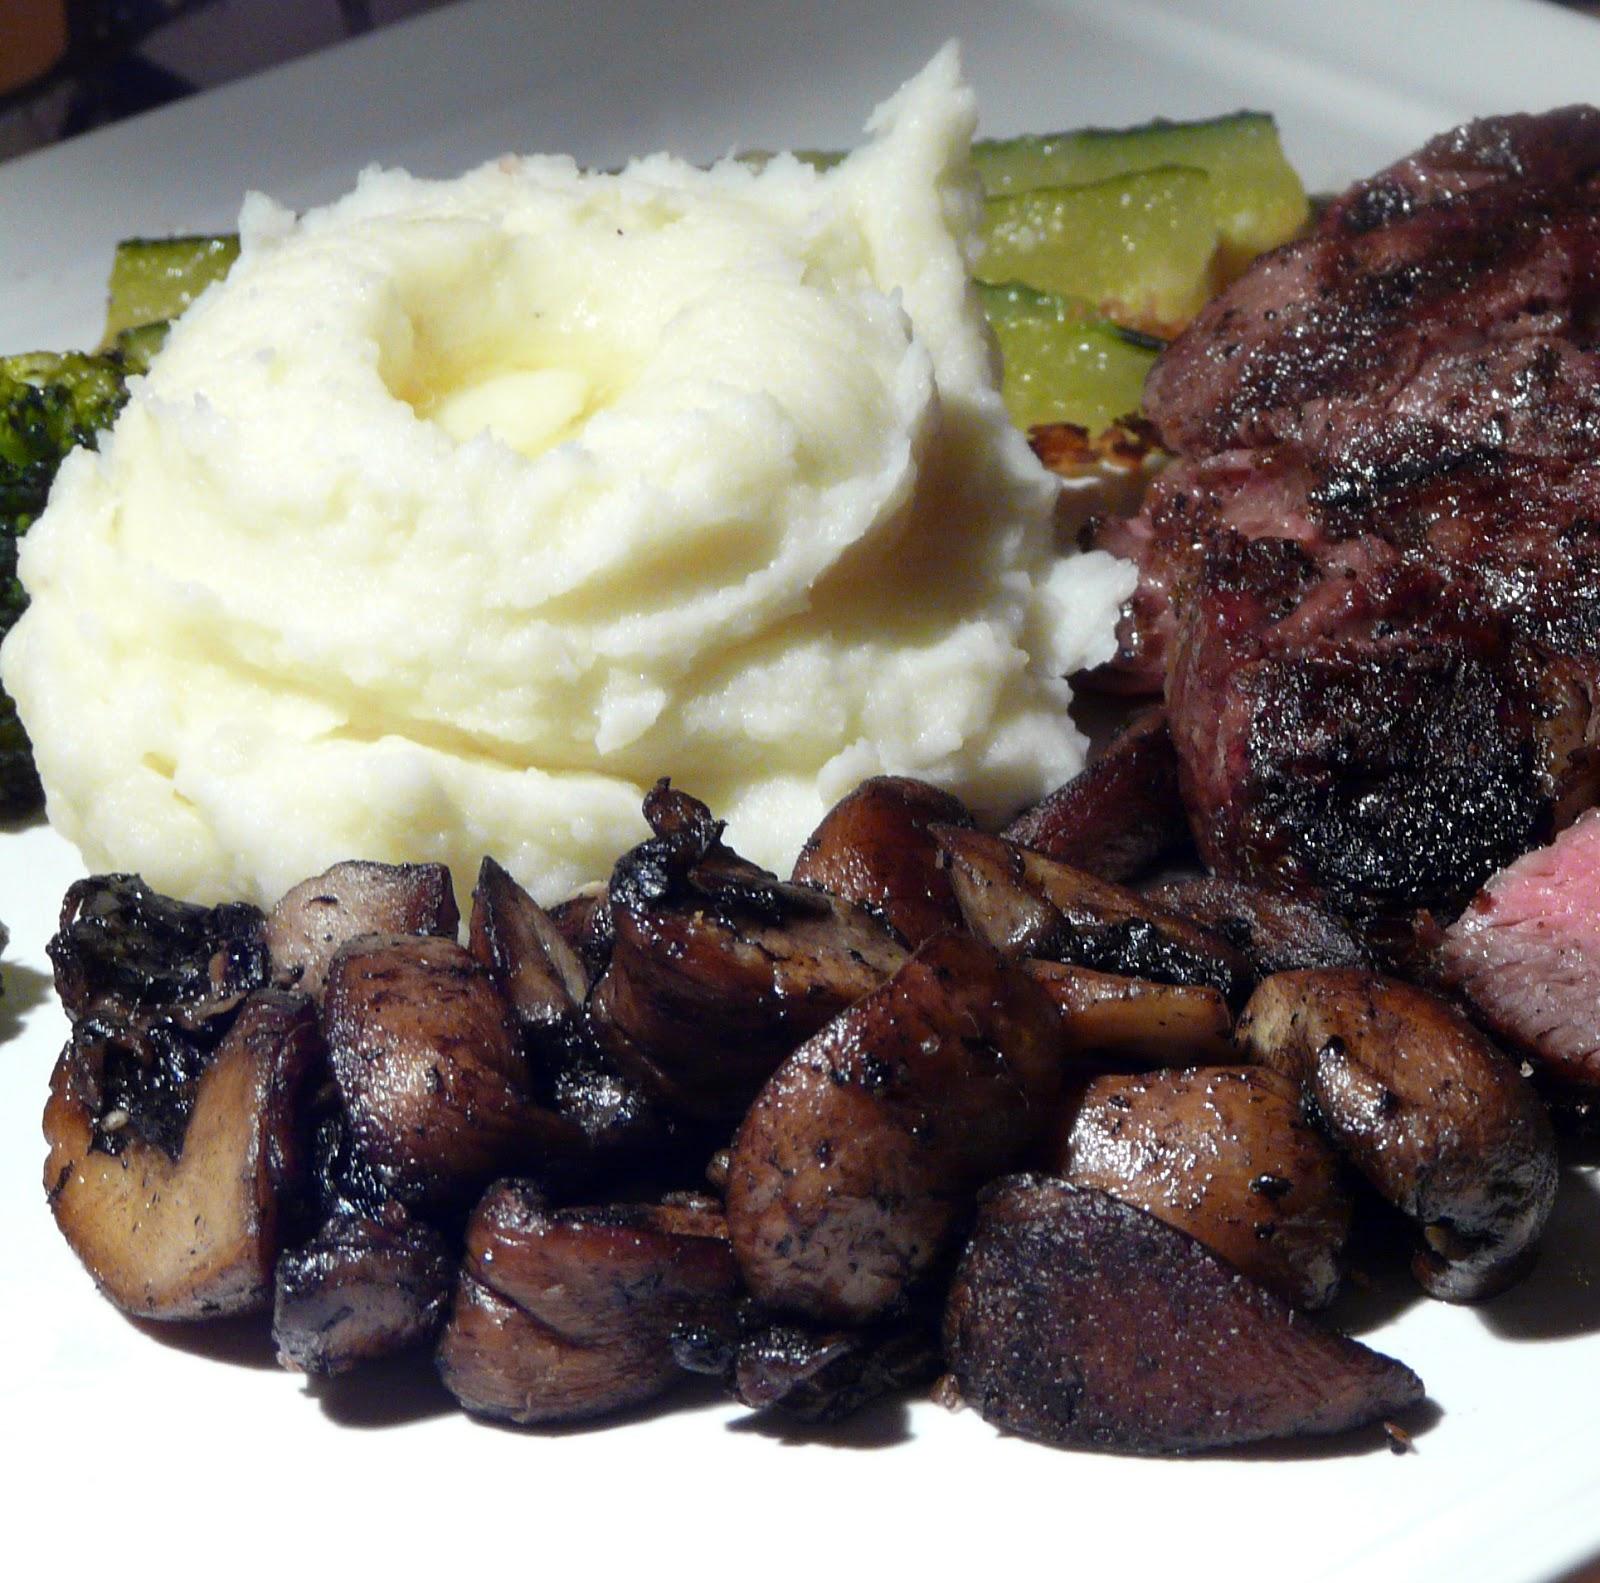 Porterhouse Steak for Two